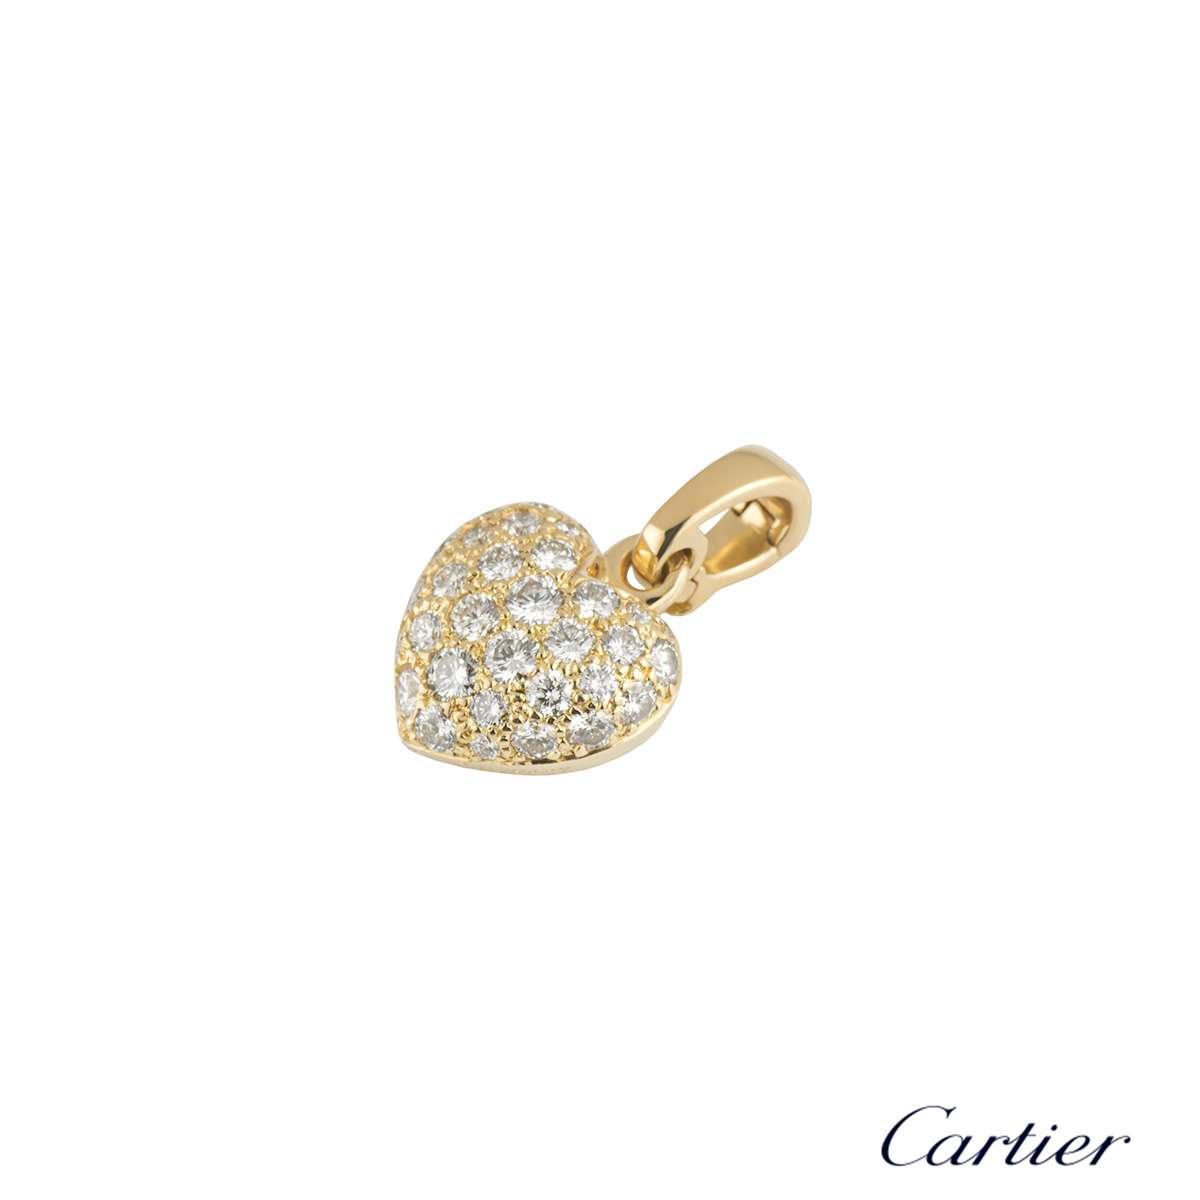 Cartier Yellow Gold Diamond Charm Pendant